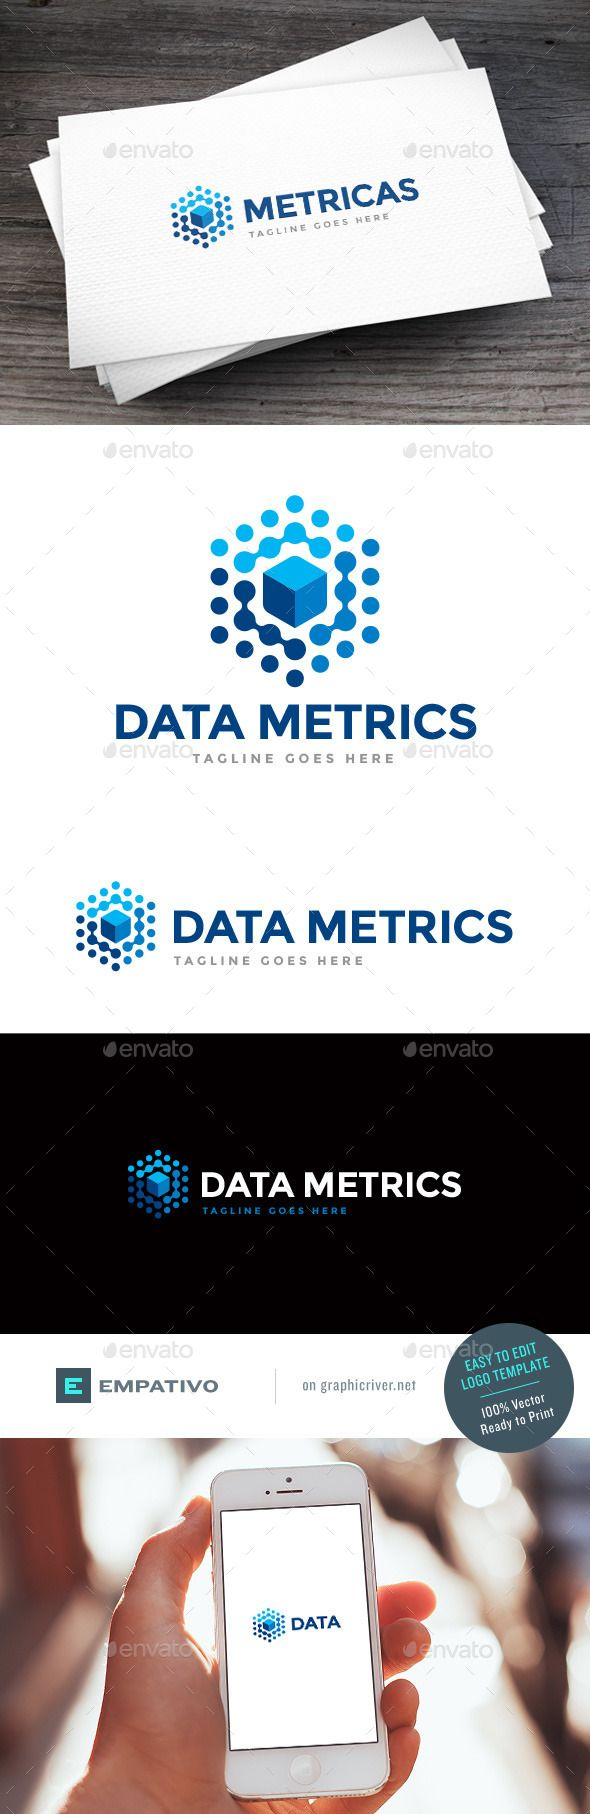 Data Metrics   Logo Design Template Vector #logotype Download it here: http://graphicriver.net/item/data-metrics-logo-template/11580000?s_rank=773?ref=nexion